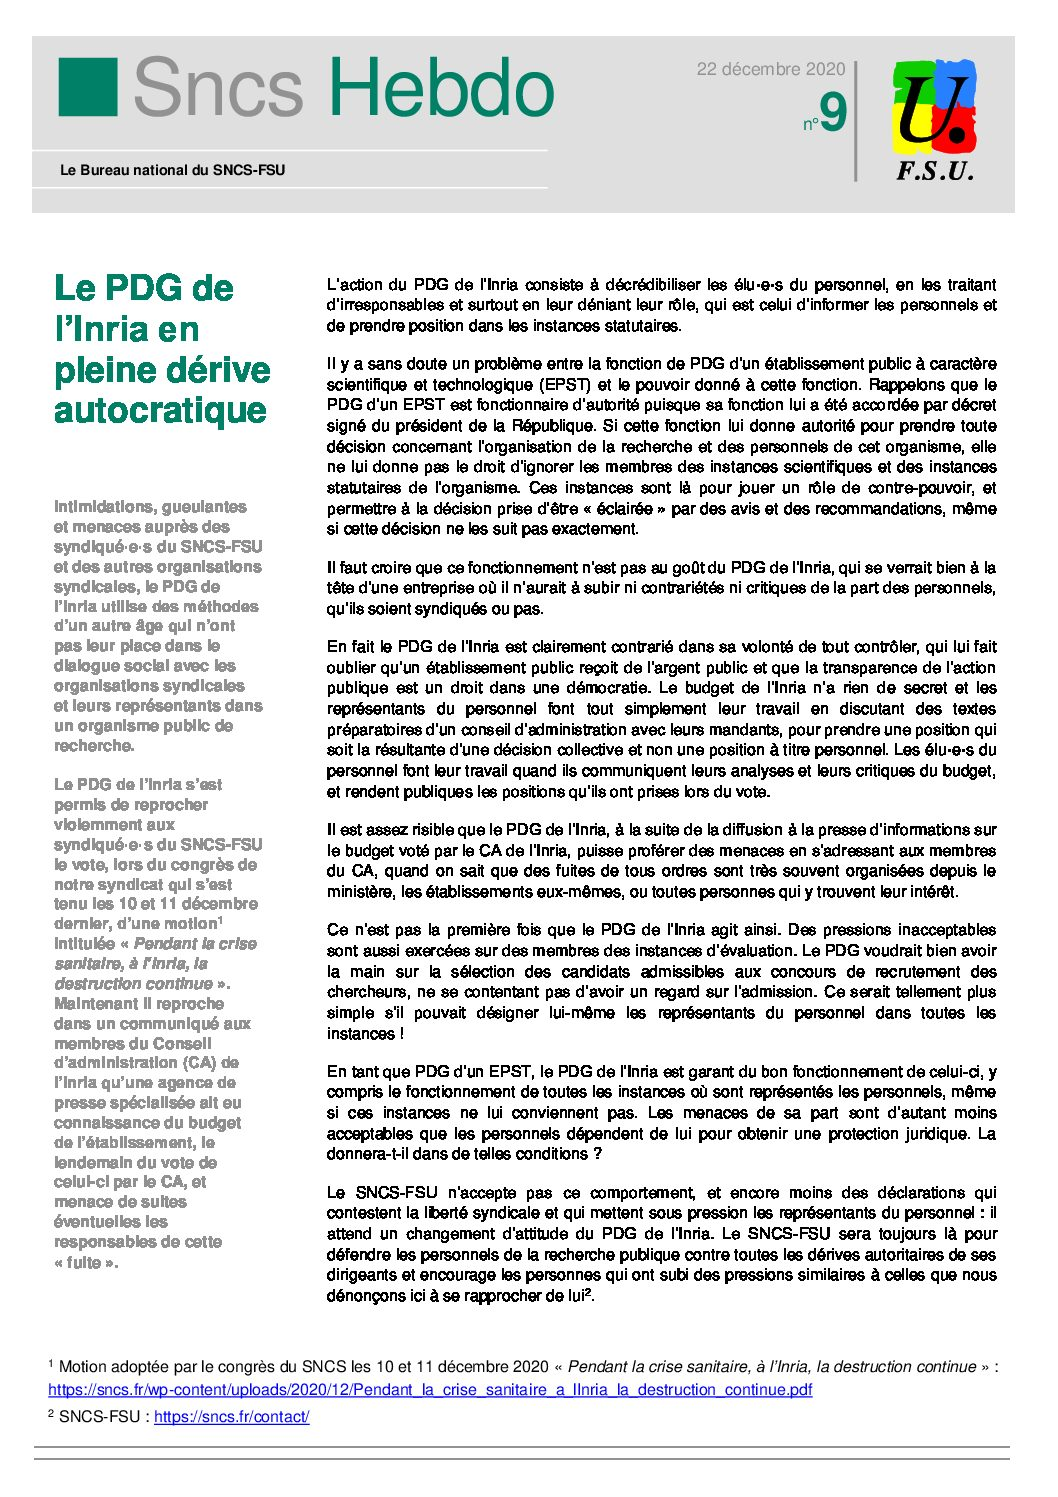 SNCSHEBDO20N°9-1-pdf.jpg